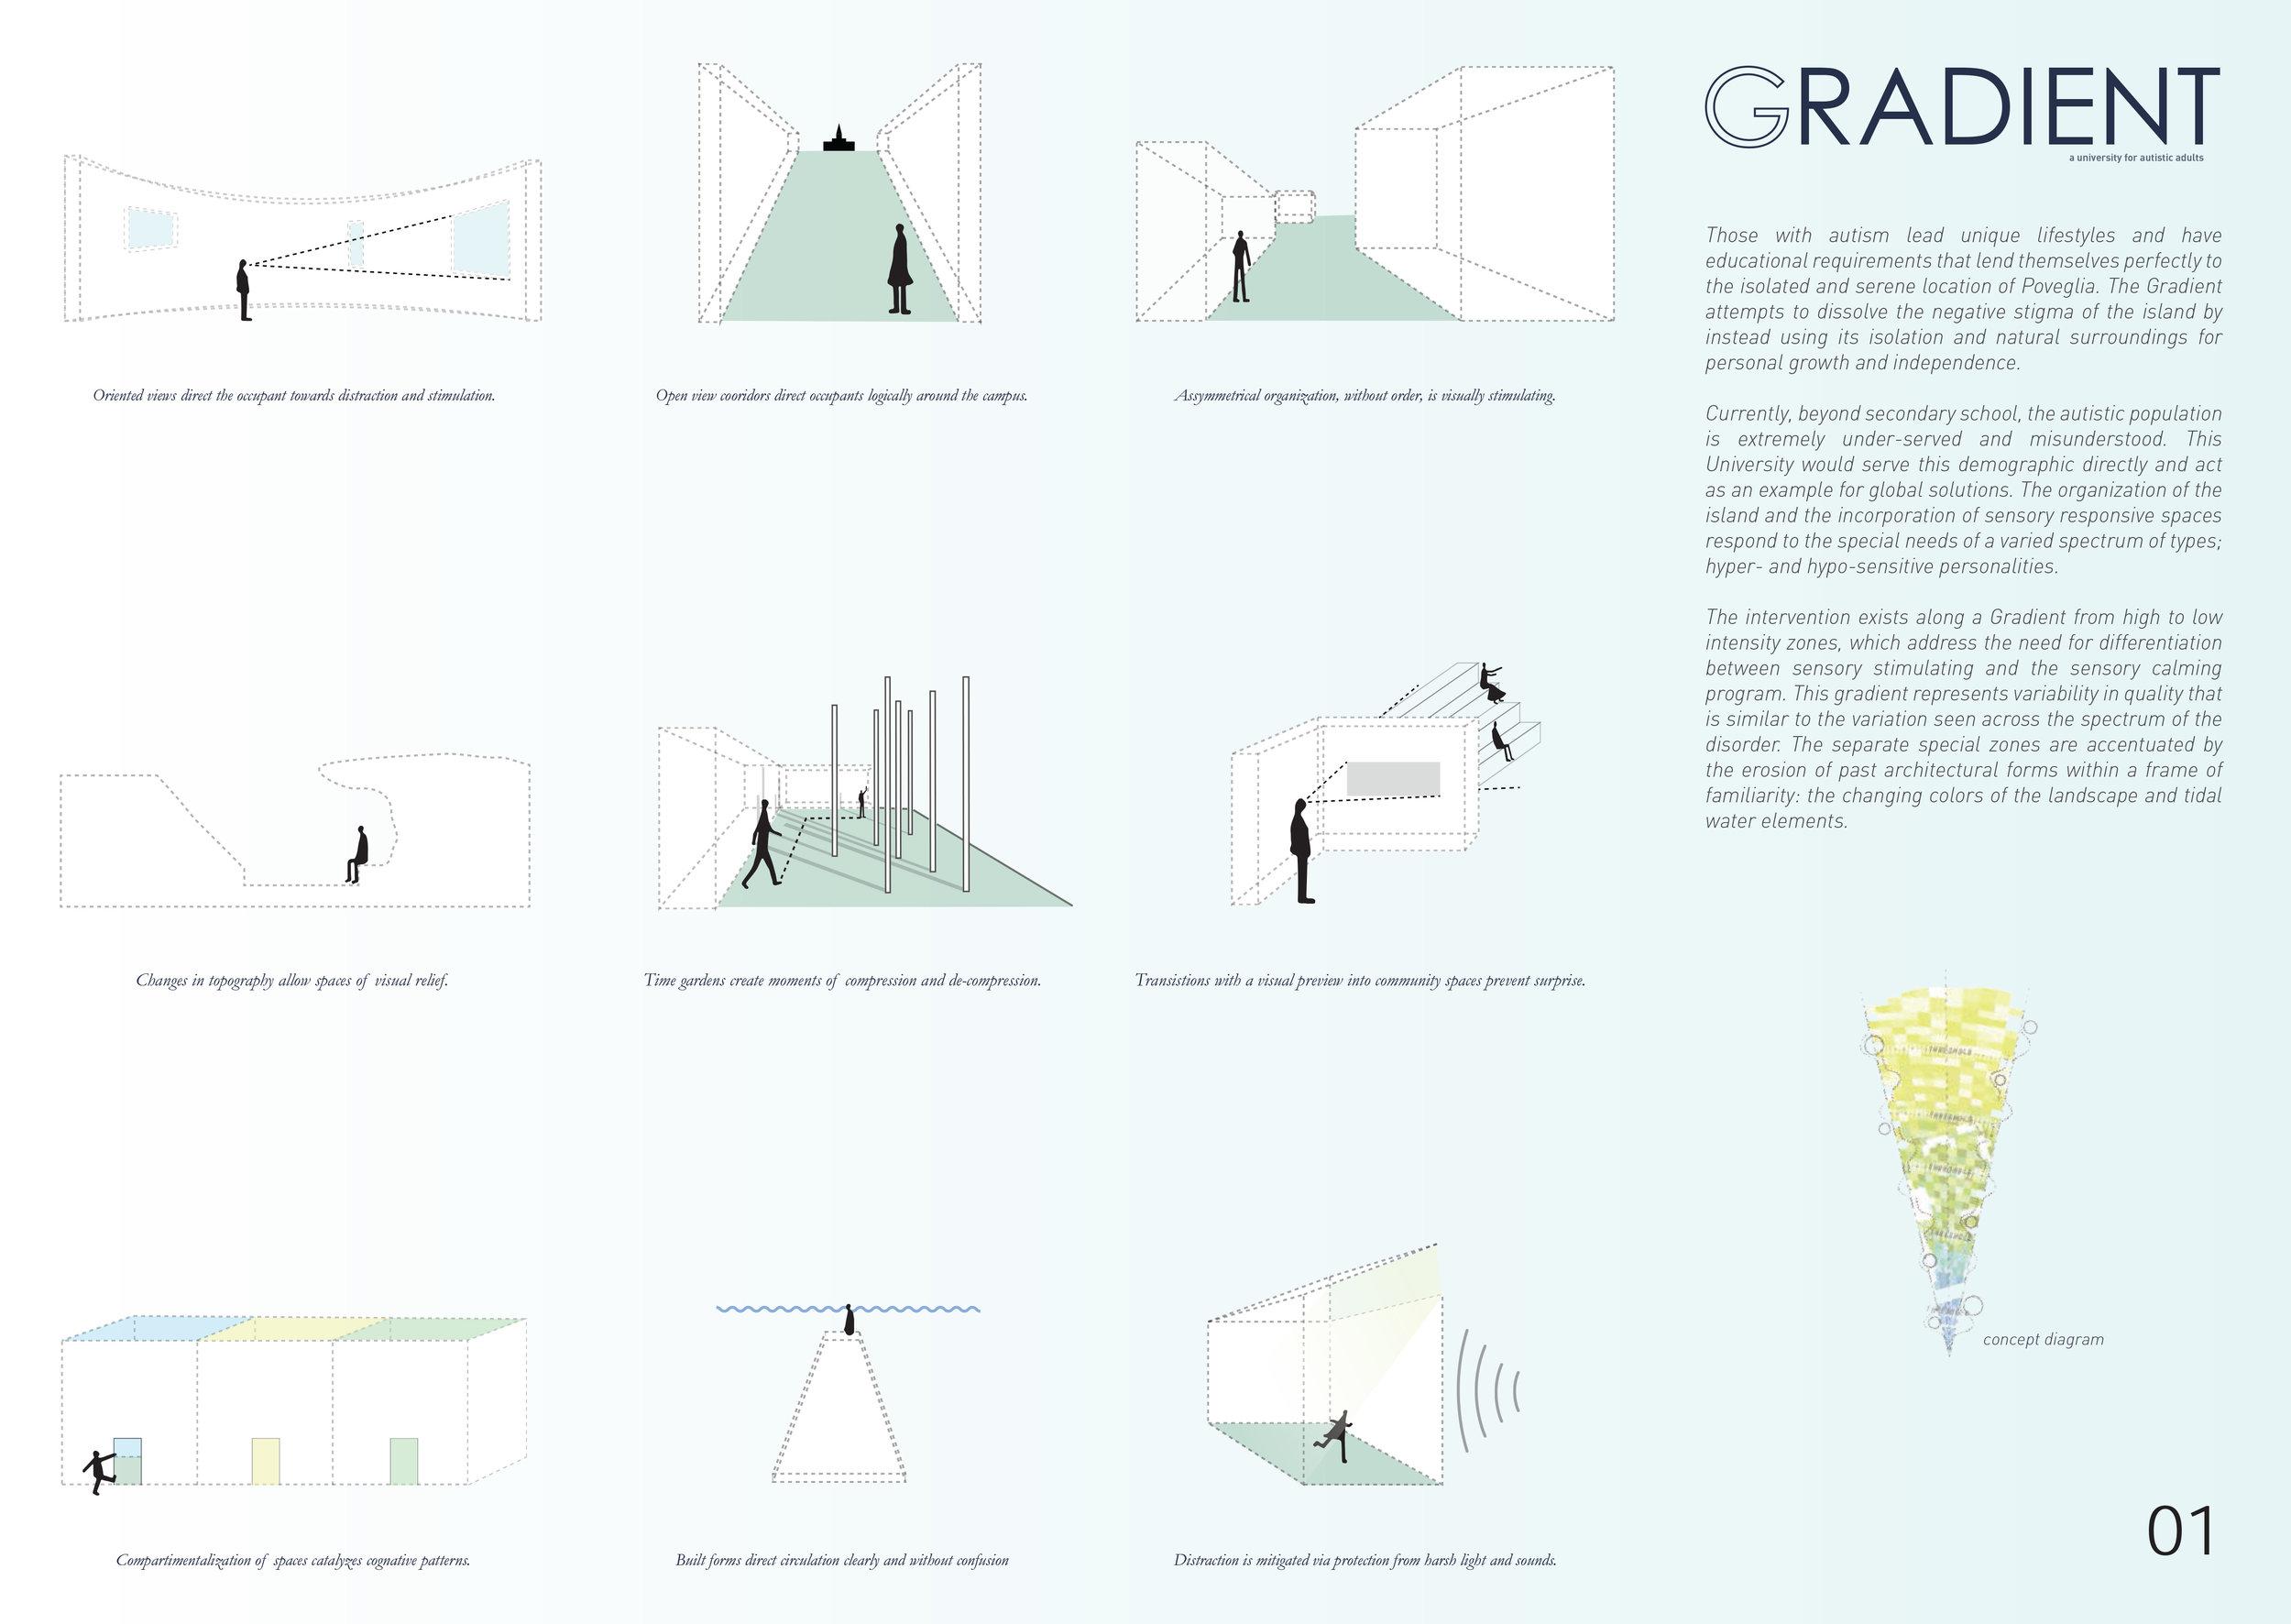 Univeristy Island Gradient Matt Fajkus Architecture MF MFx16_1.jpg